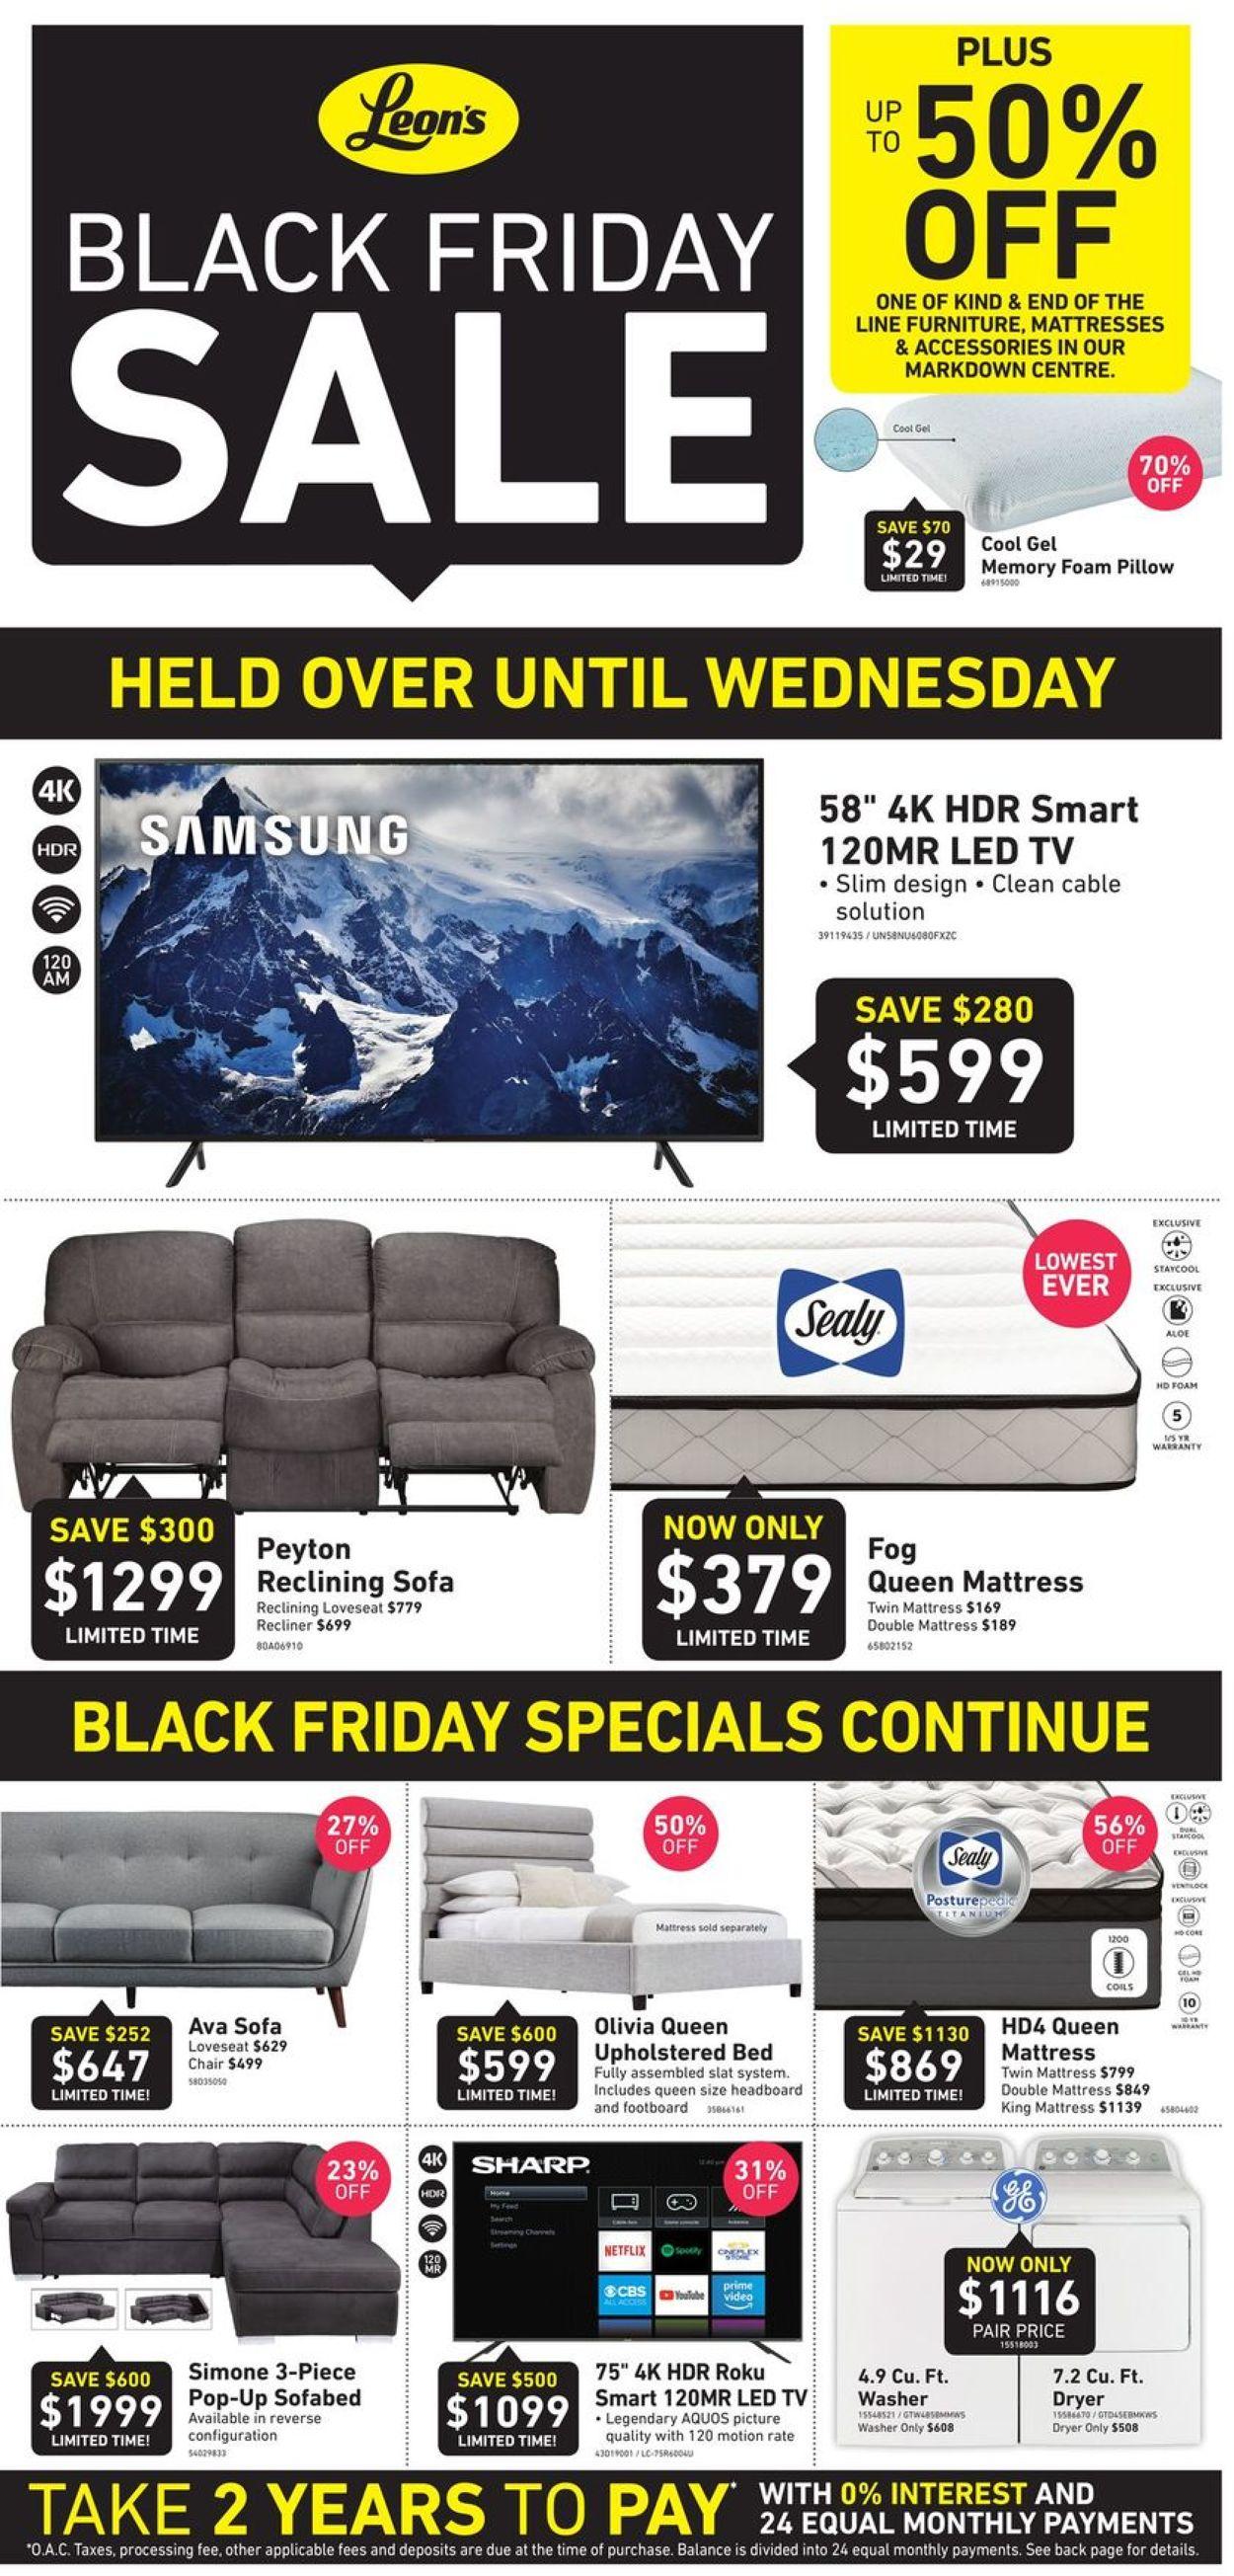 Leon's BLACK FRIDAY SALE 2019 Flyer - 11/29-12/04/2019